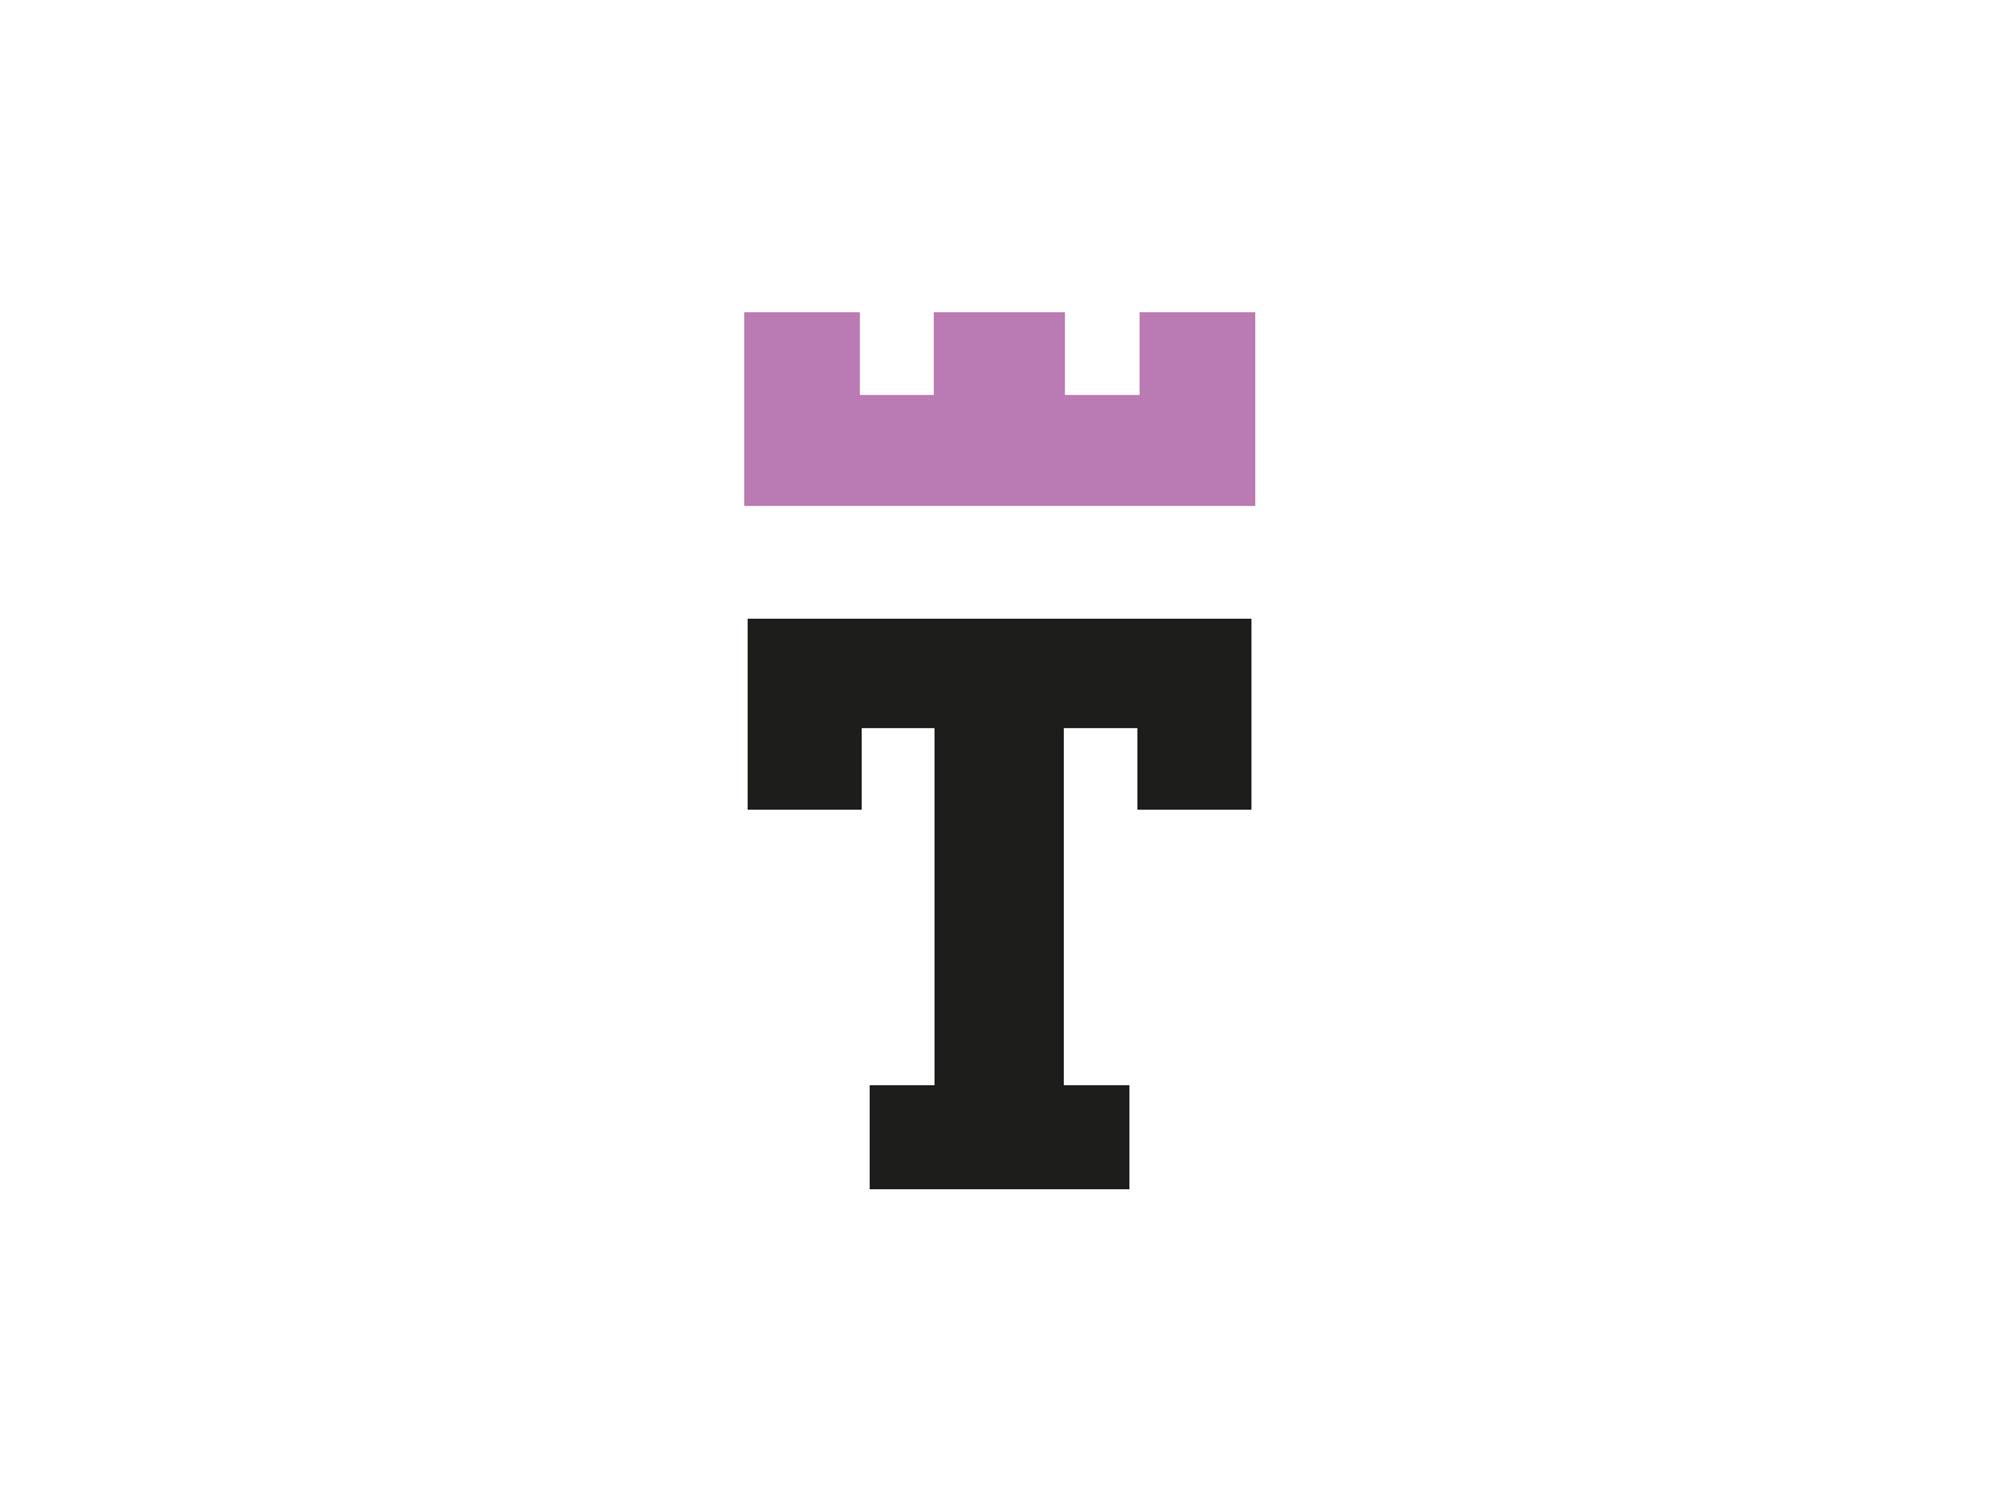 Visit-tones-for-left-bridge-logo-I.jpg